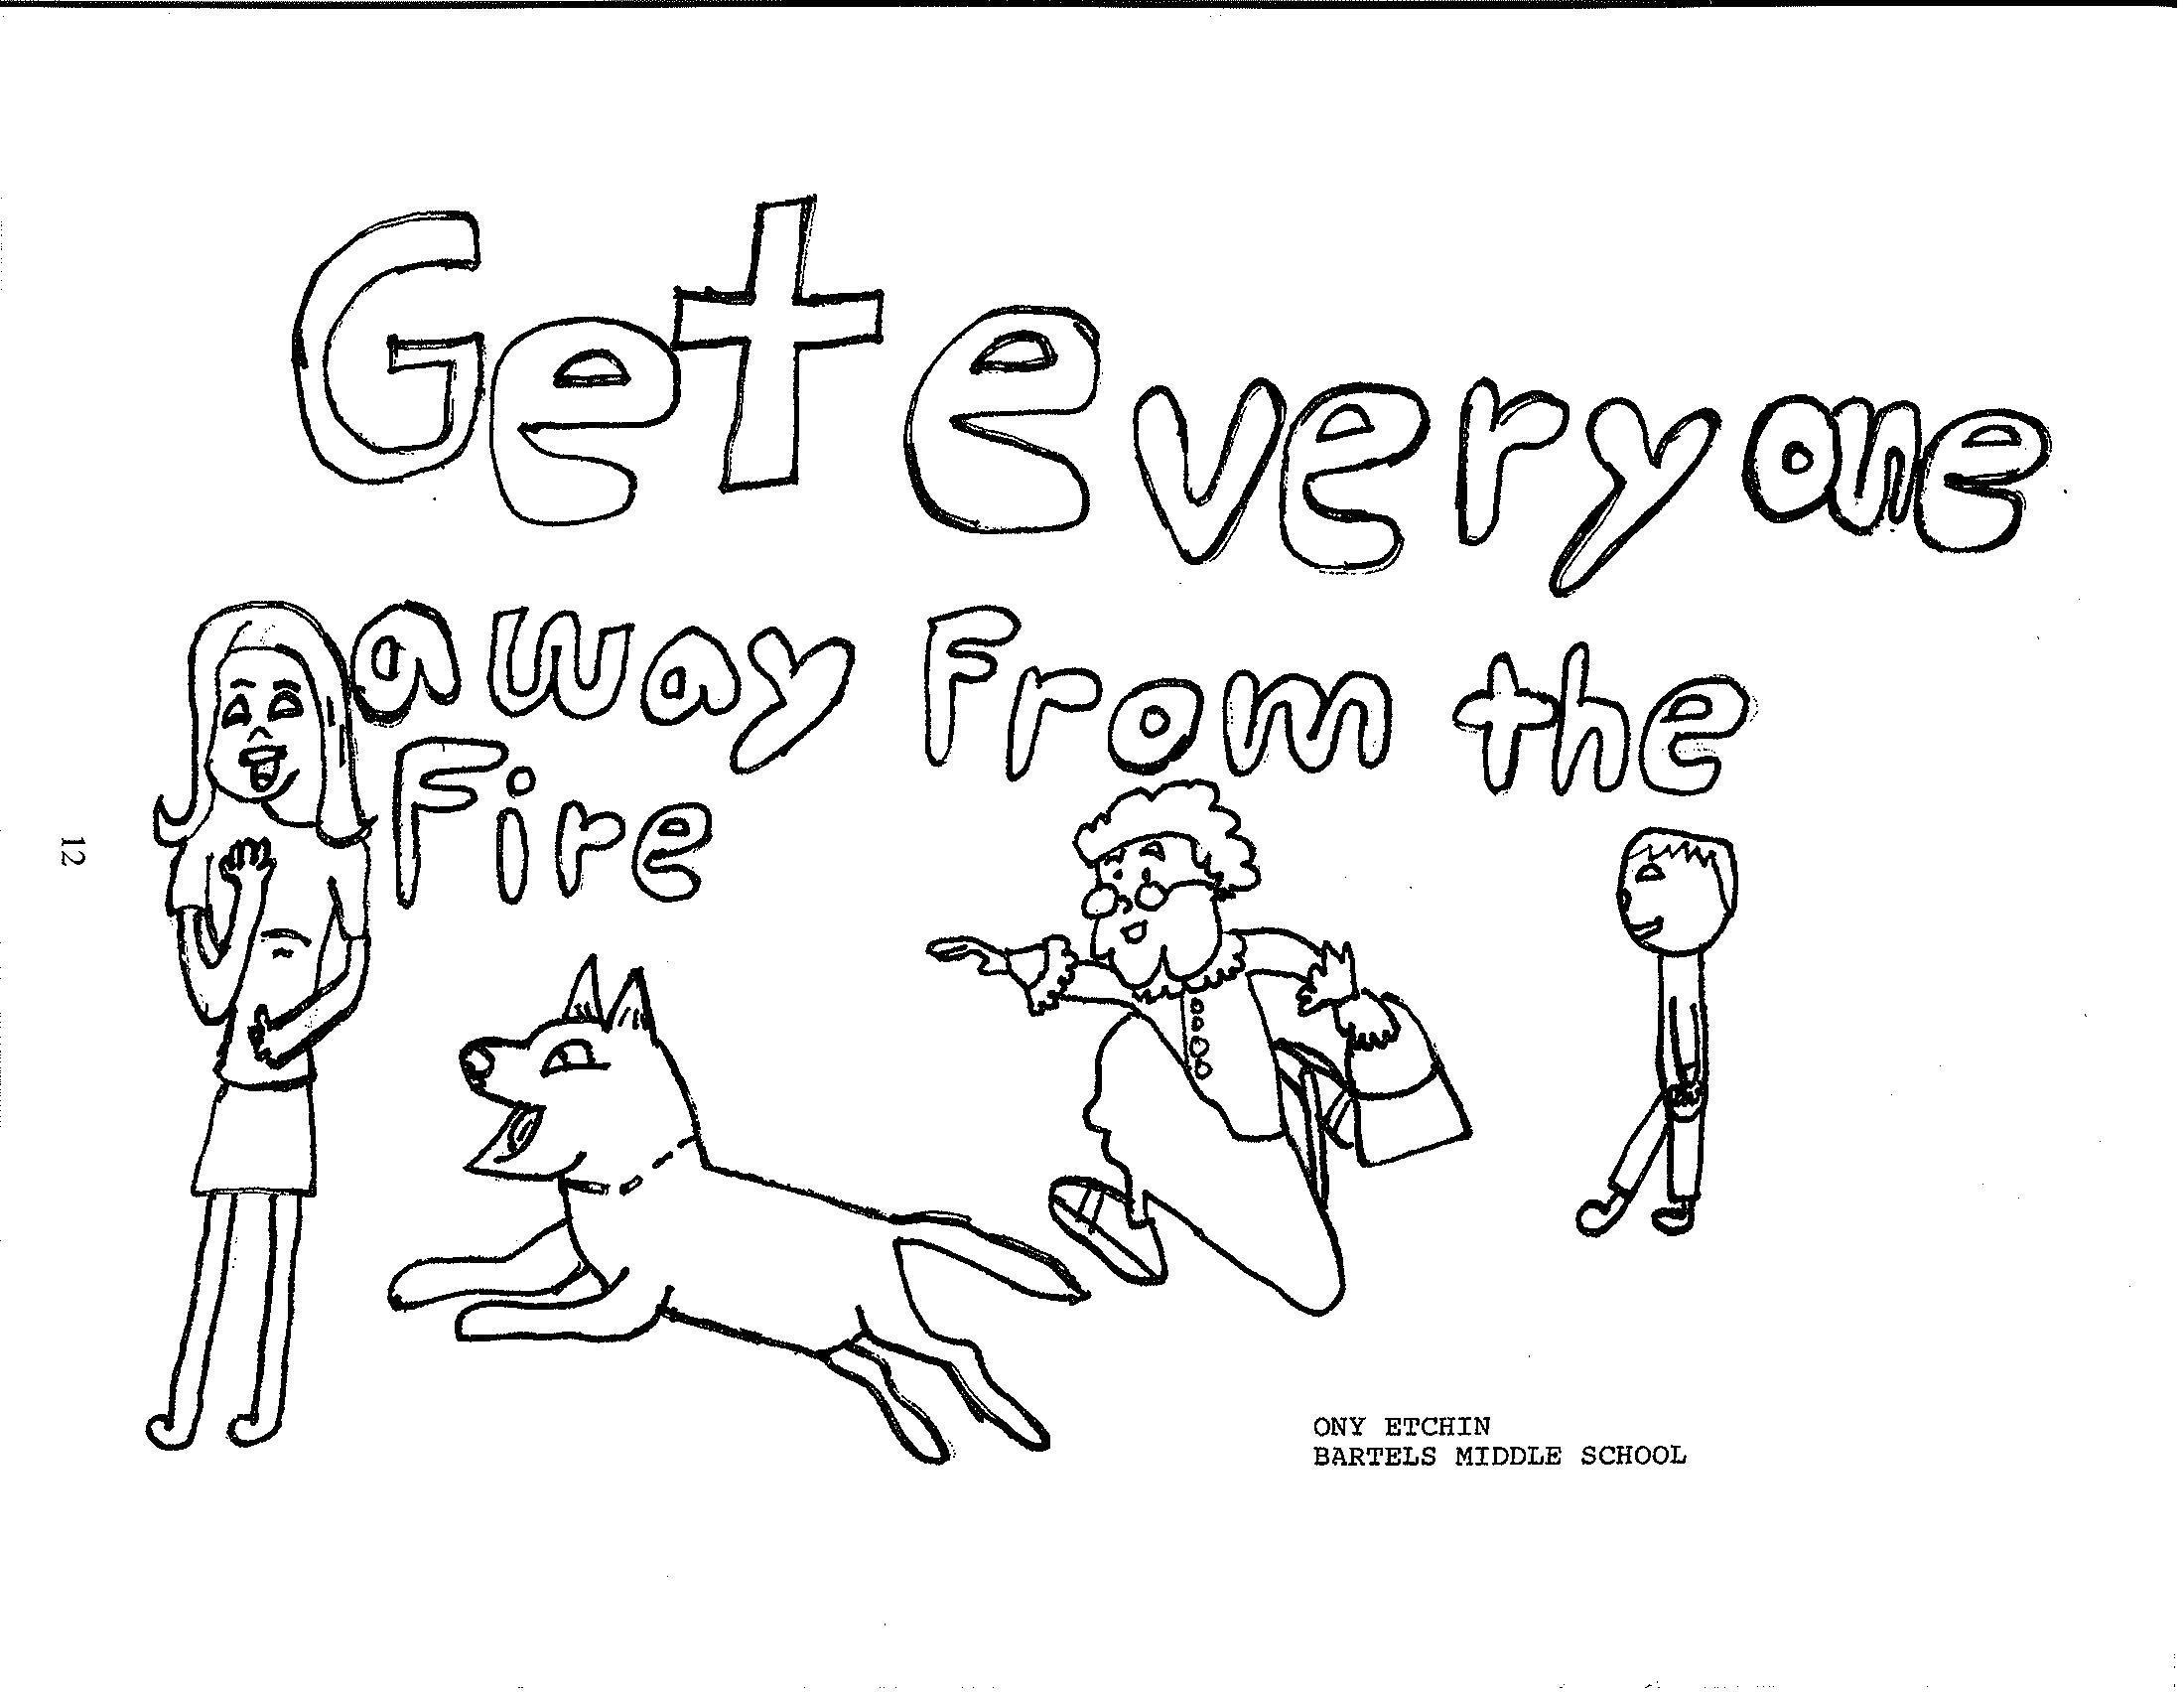 Chester Sroka Fire Prevention Fund – City of Portage, WI